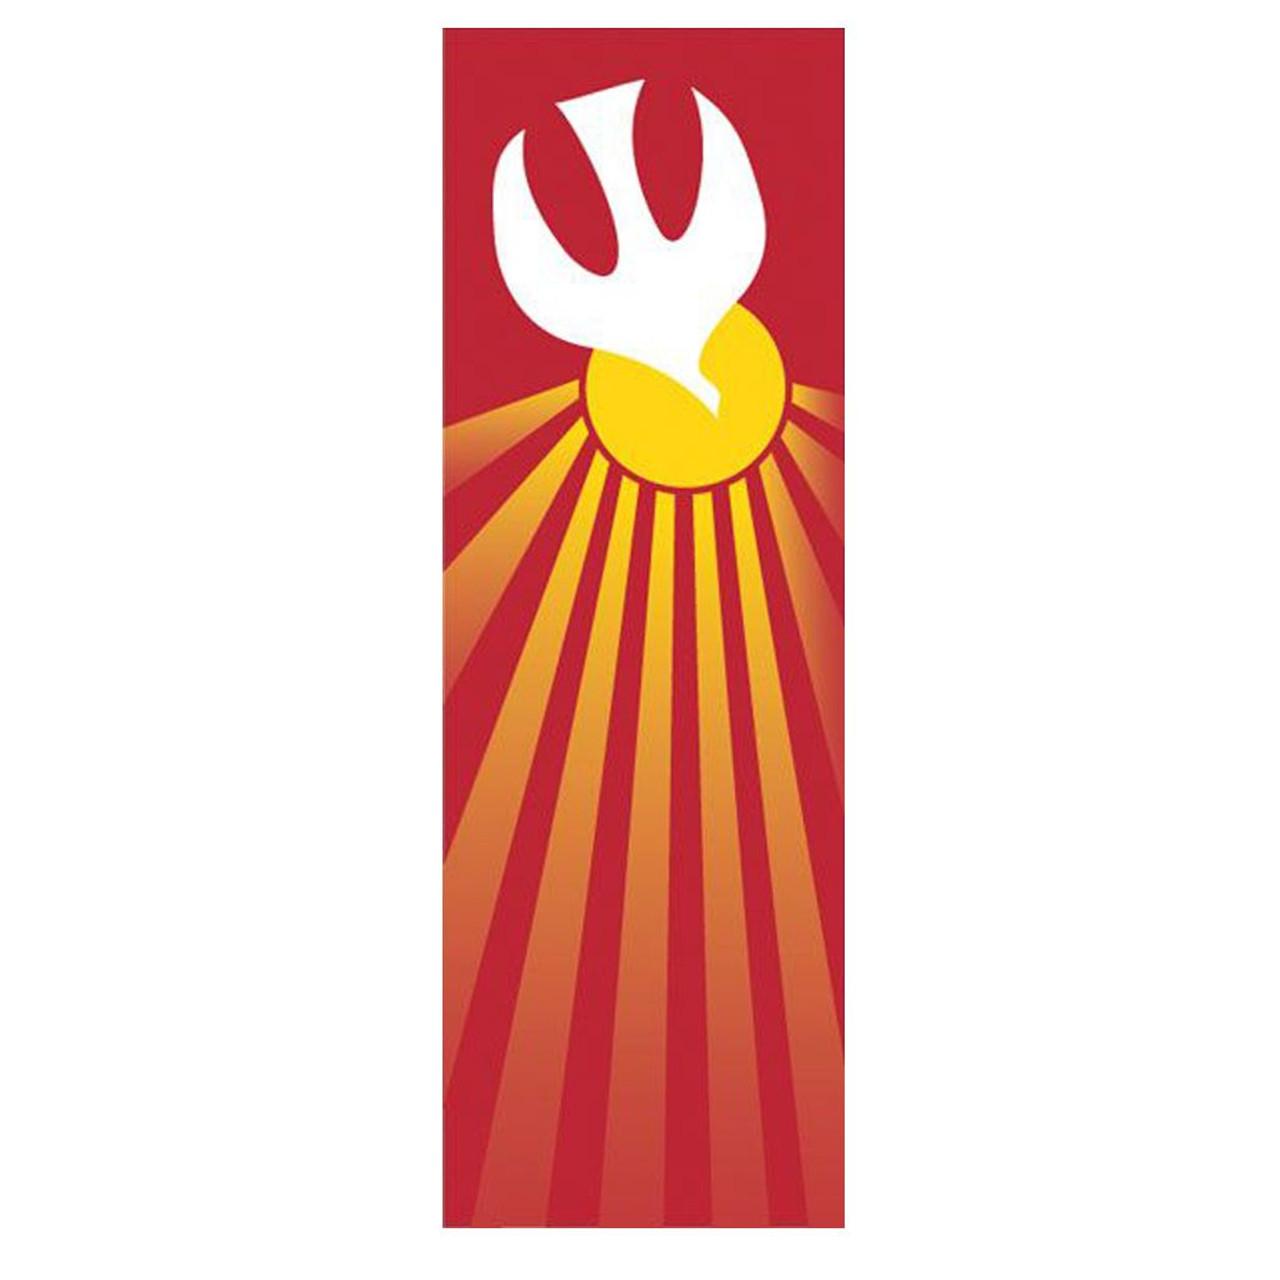 7115 Holy Spirit Church Banner 3' x 10' Red